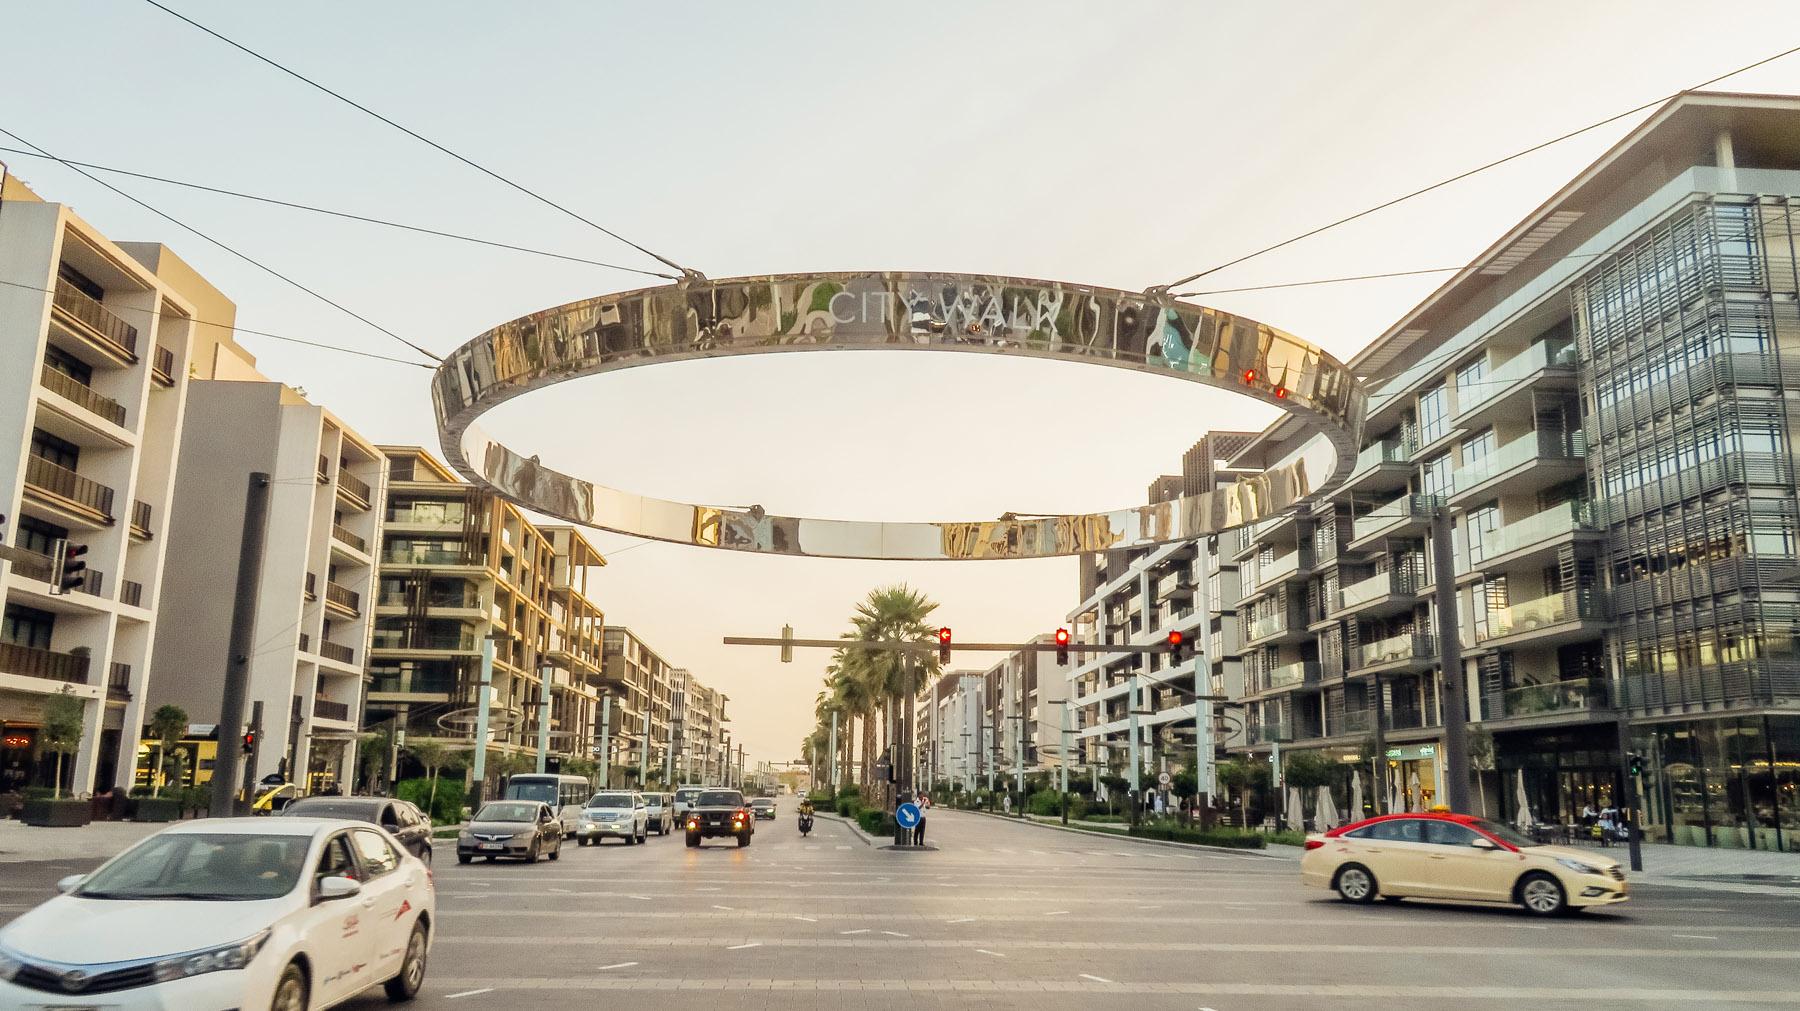 Orient Kreuzfahrt Taxi fahren in Dubai